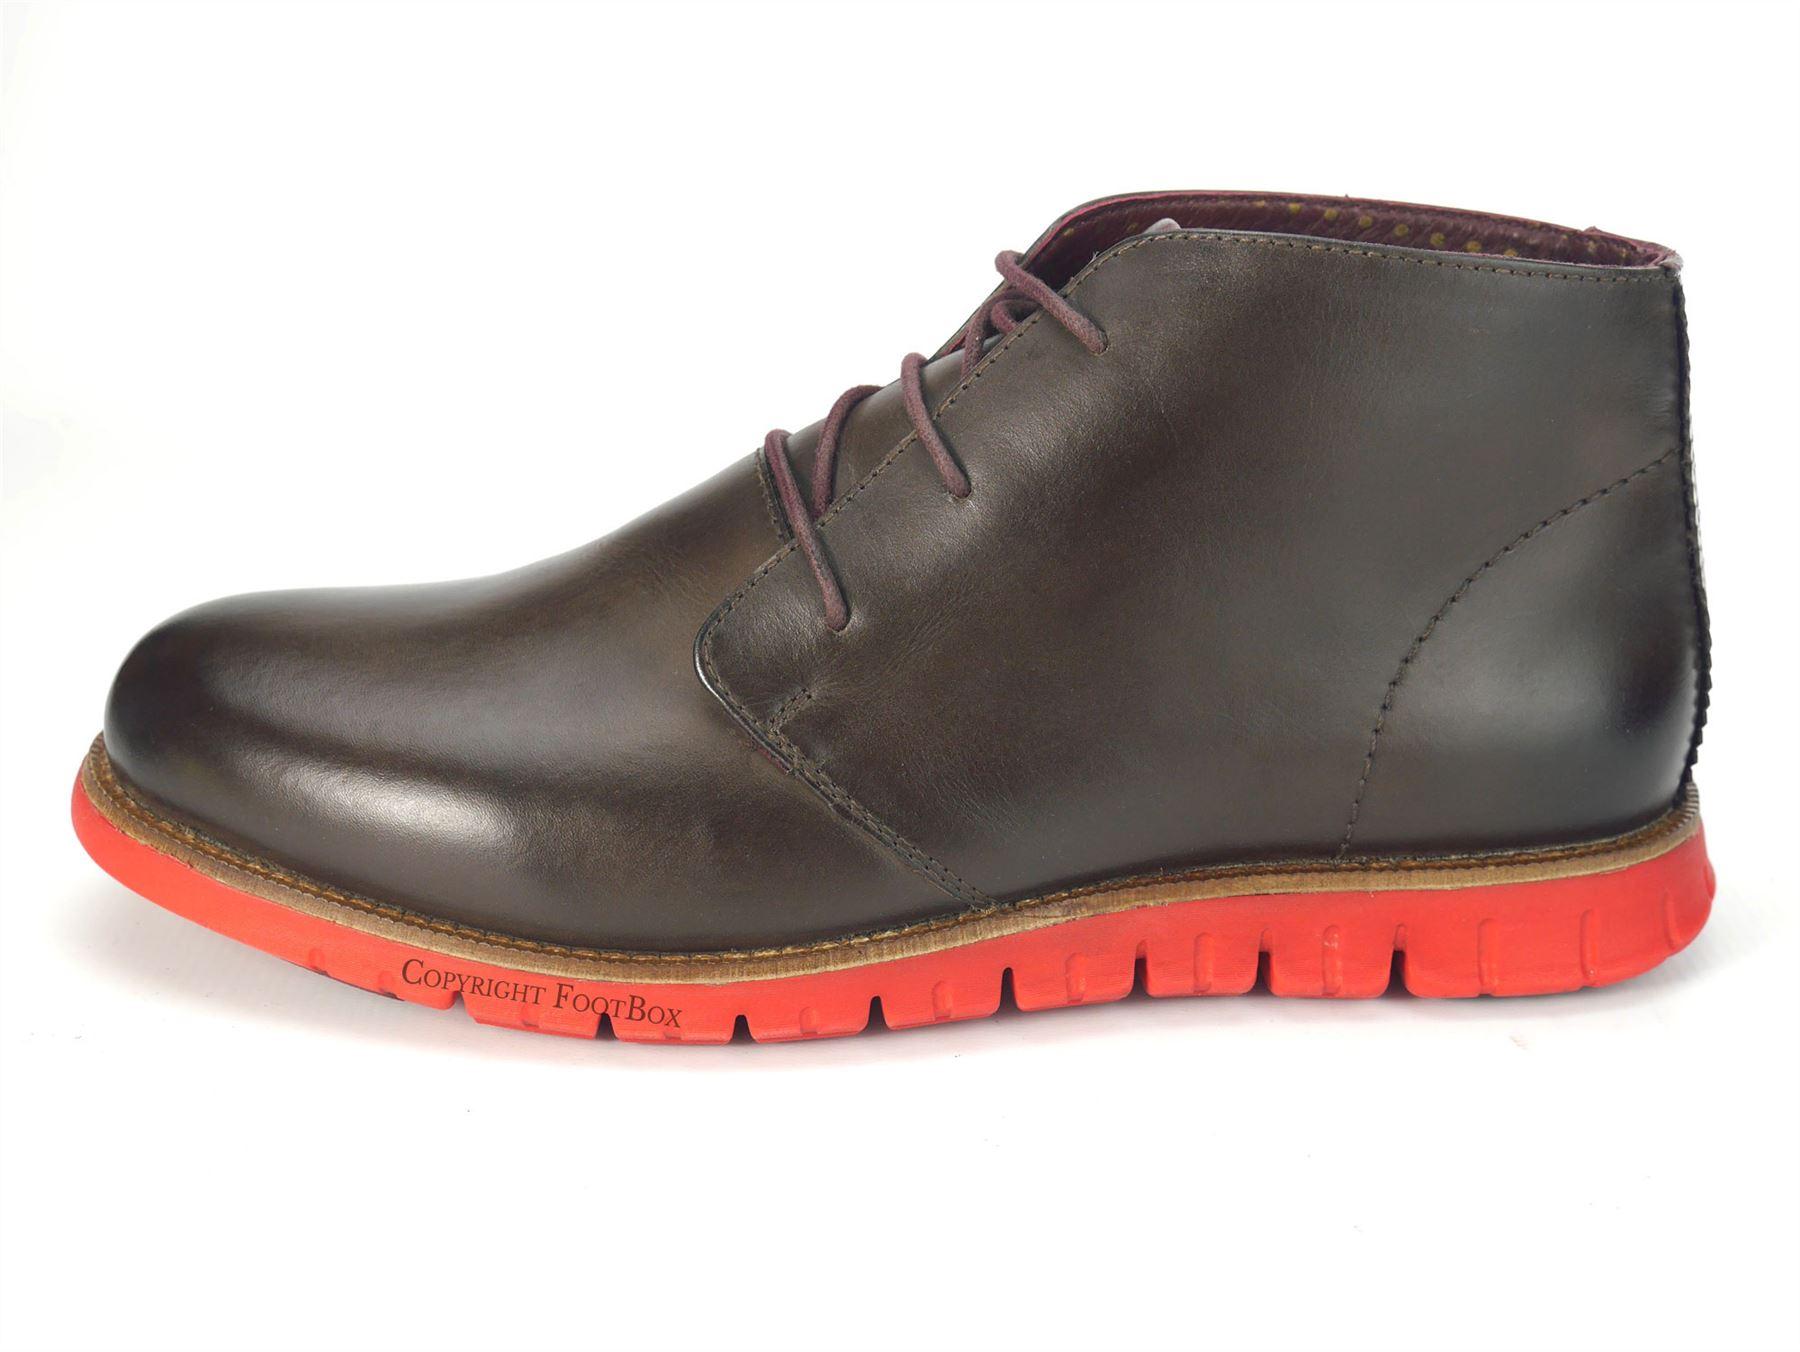 UK 3-8 5908 Femmes Dr Lightfoot étain Comfort Soft Flexi Walking Chaussures montantes